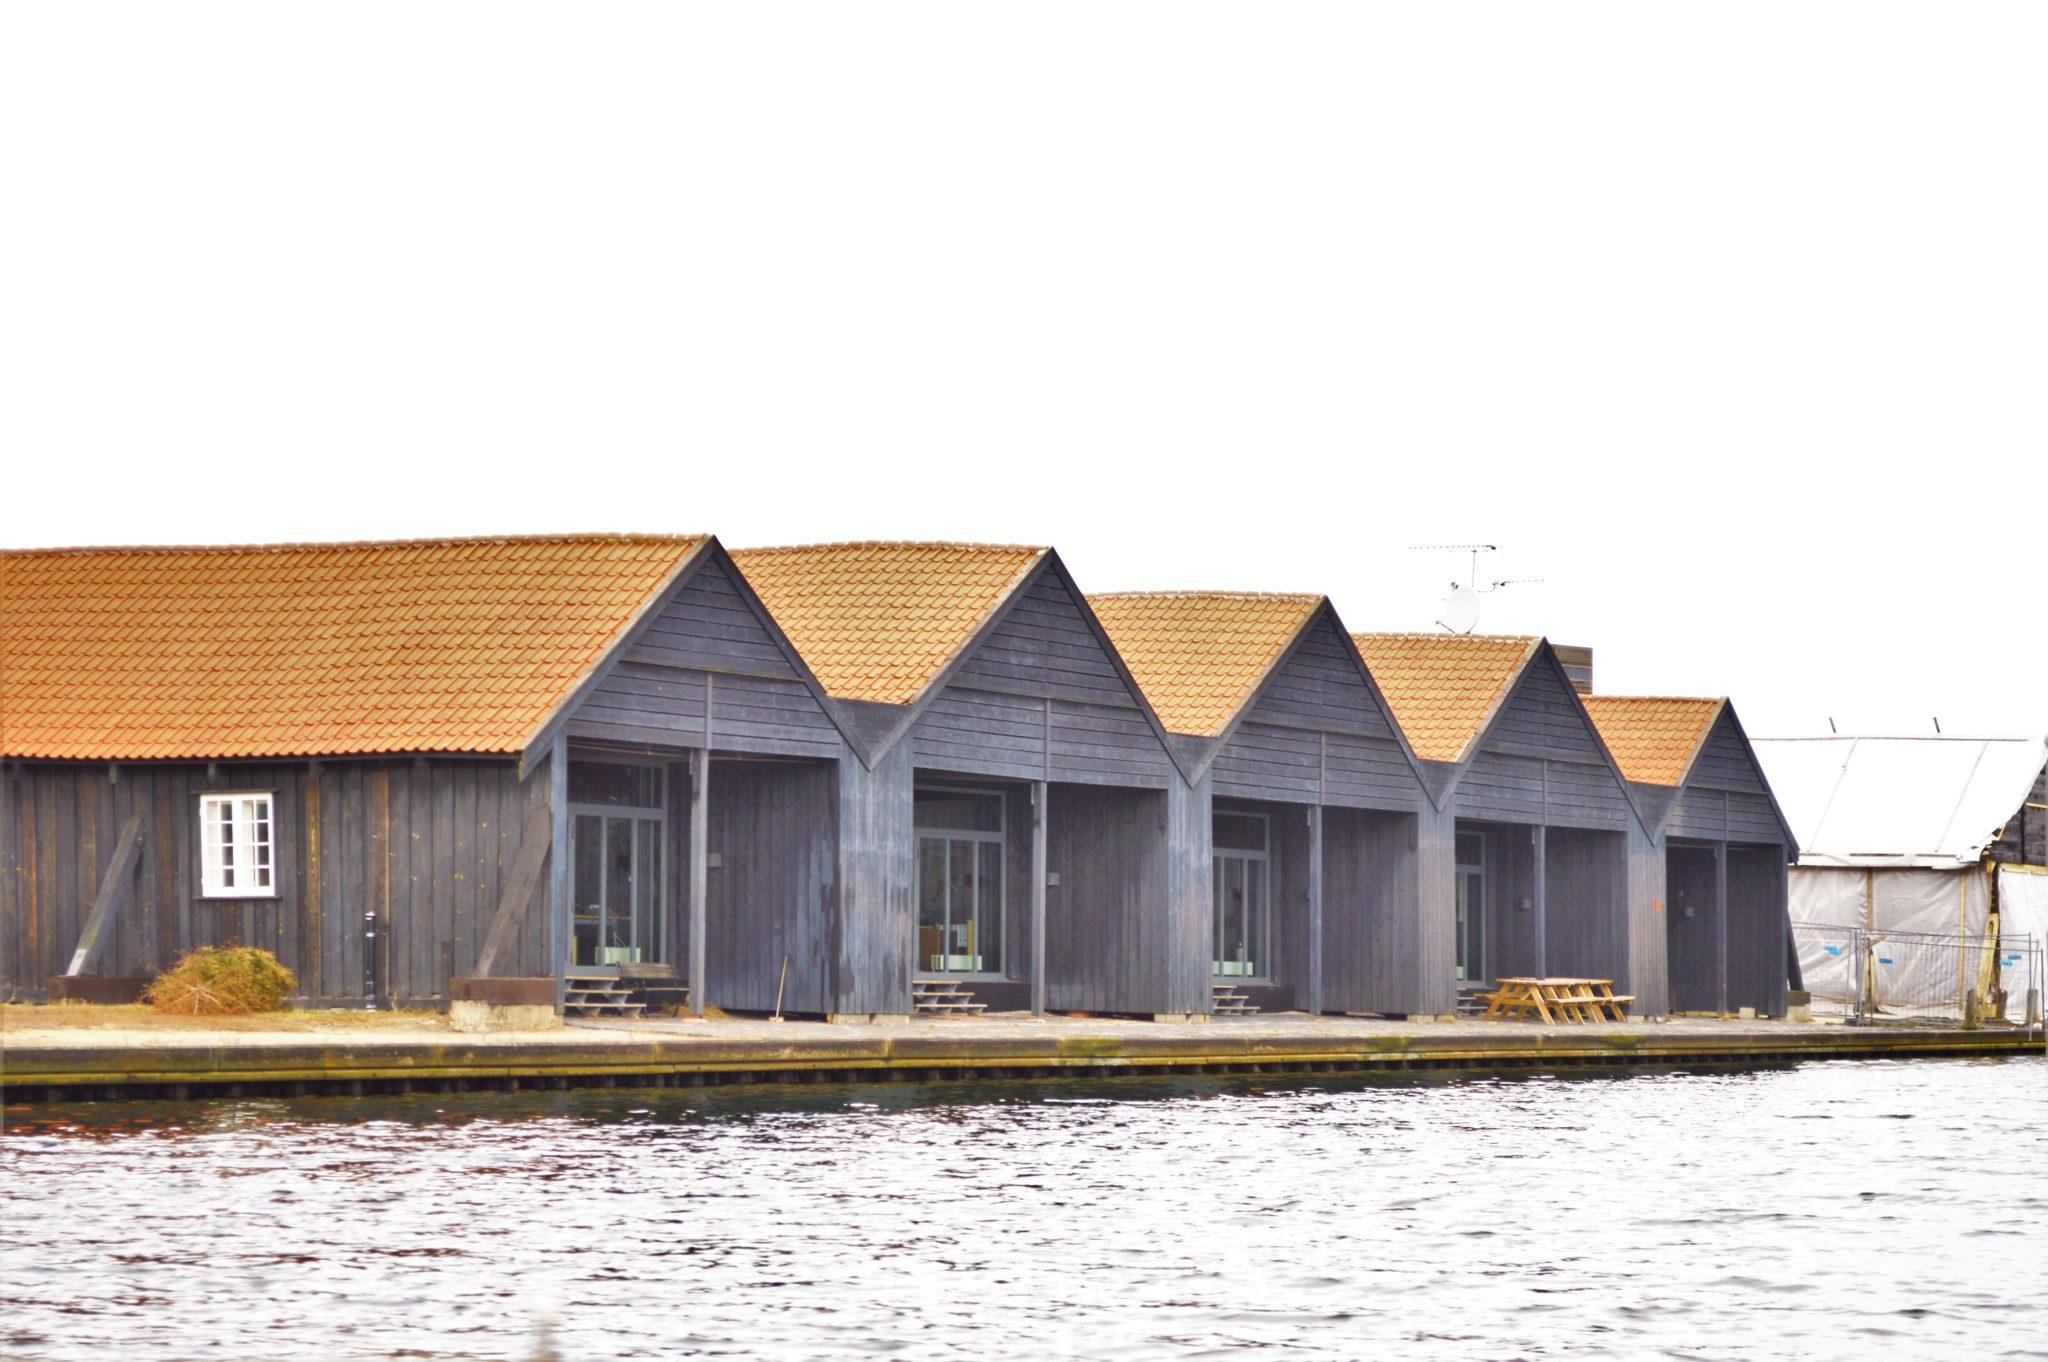 Navy boat sheds in Copenhagen, Denmark